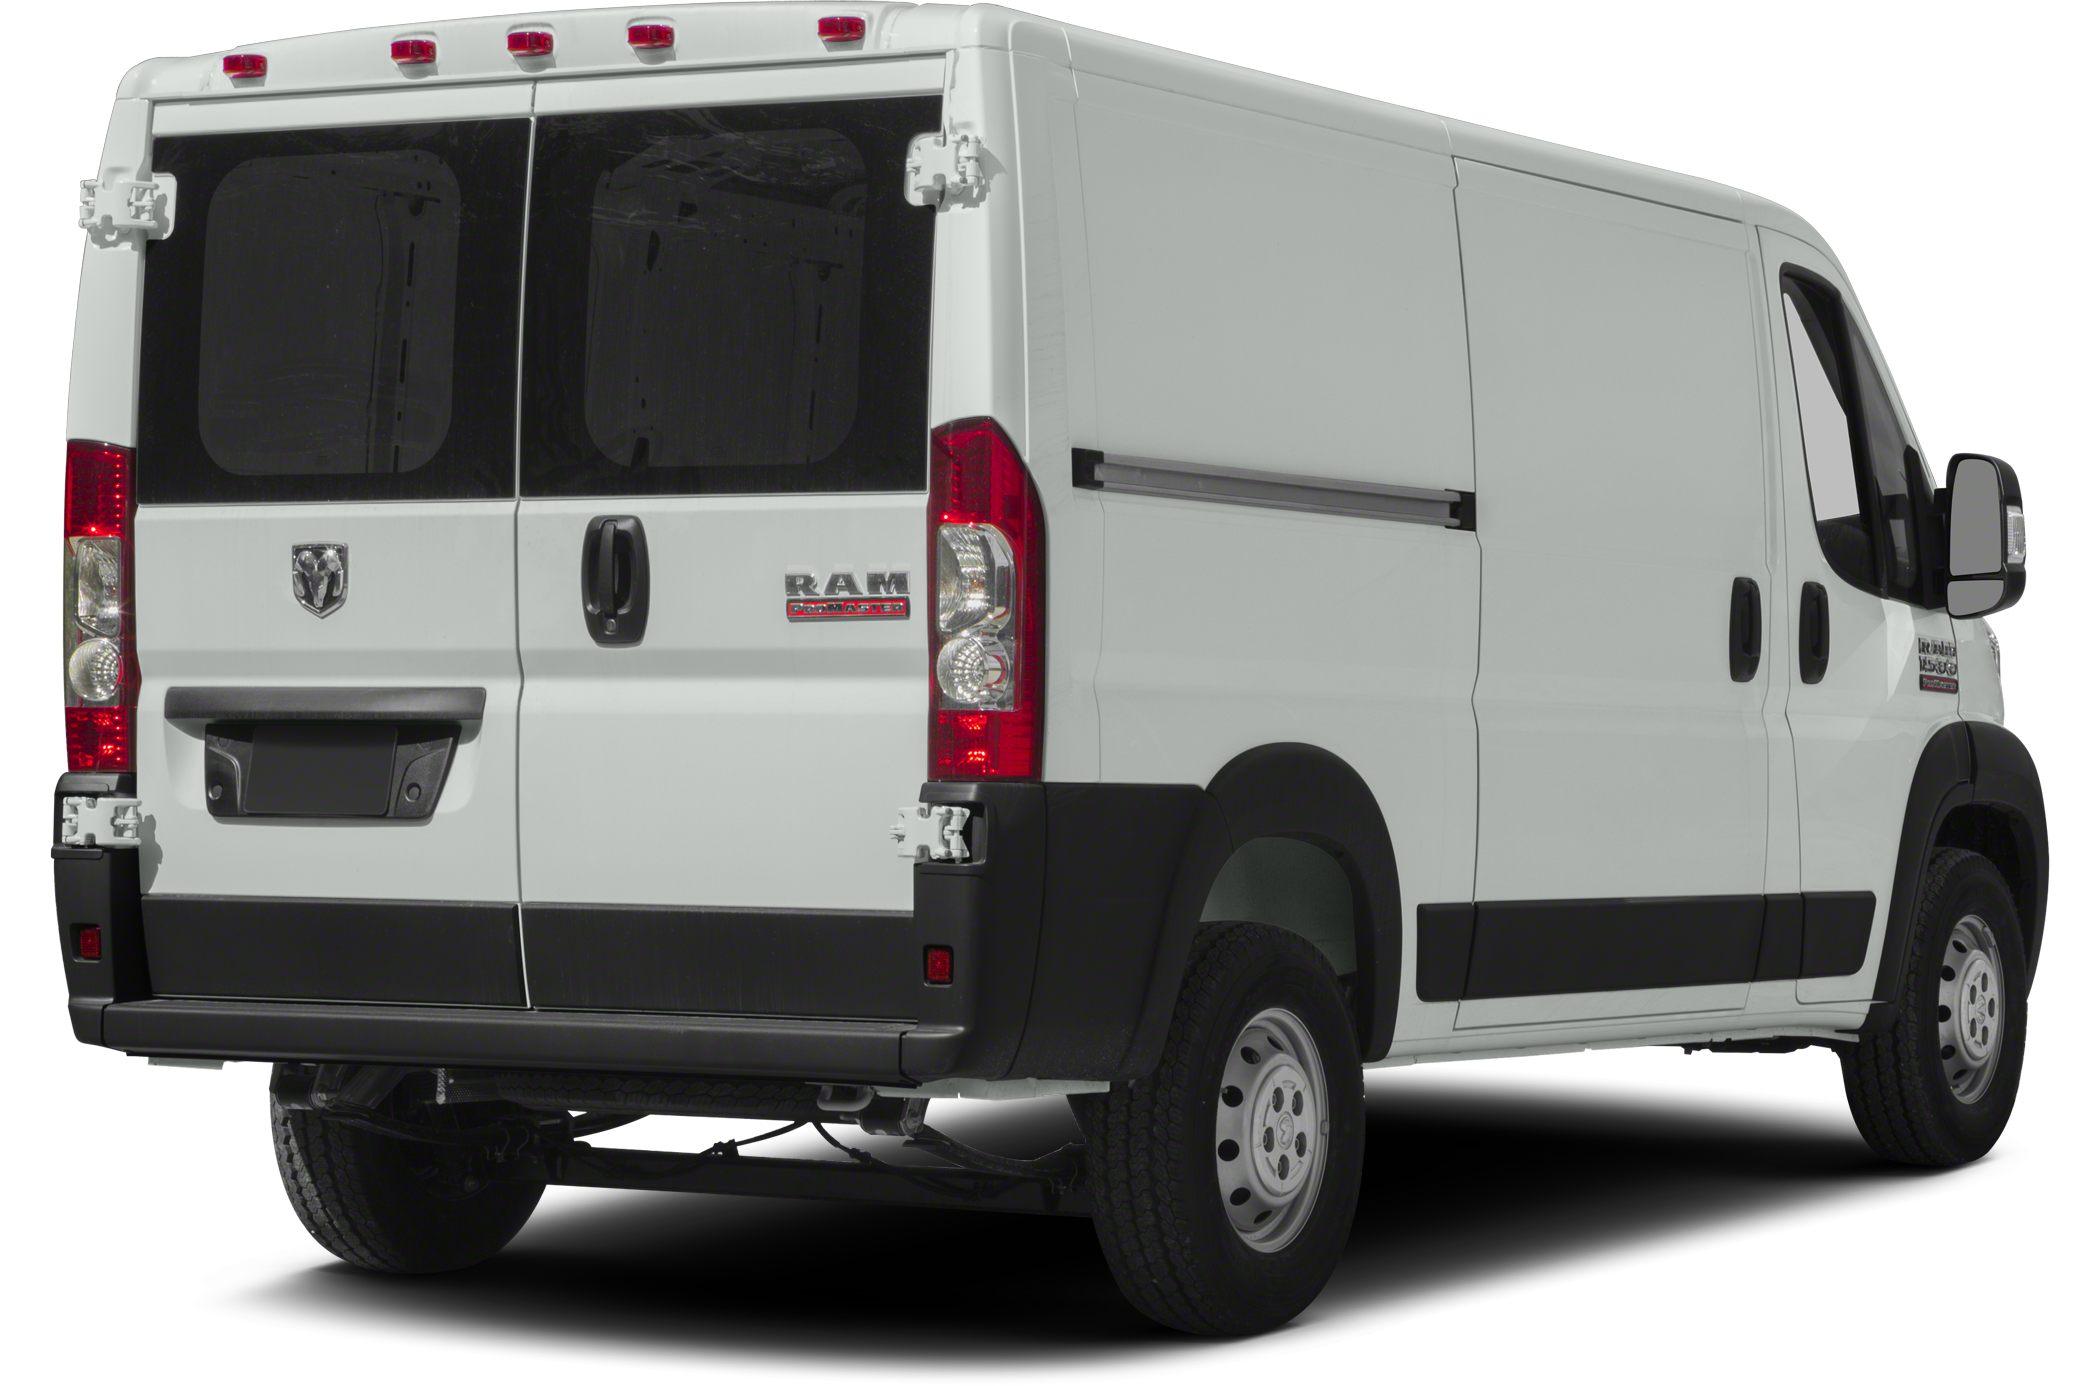 2014 Ram Promaster Cargo Van Image 10